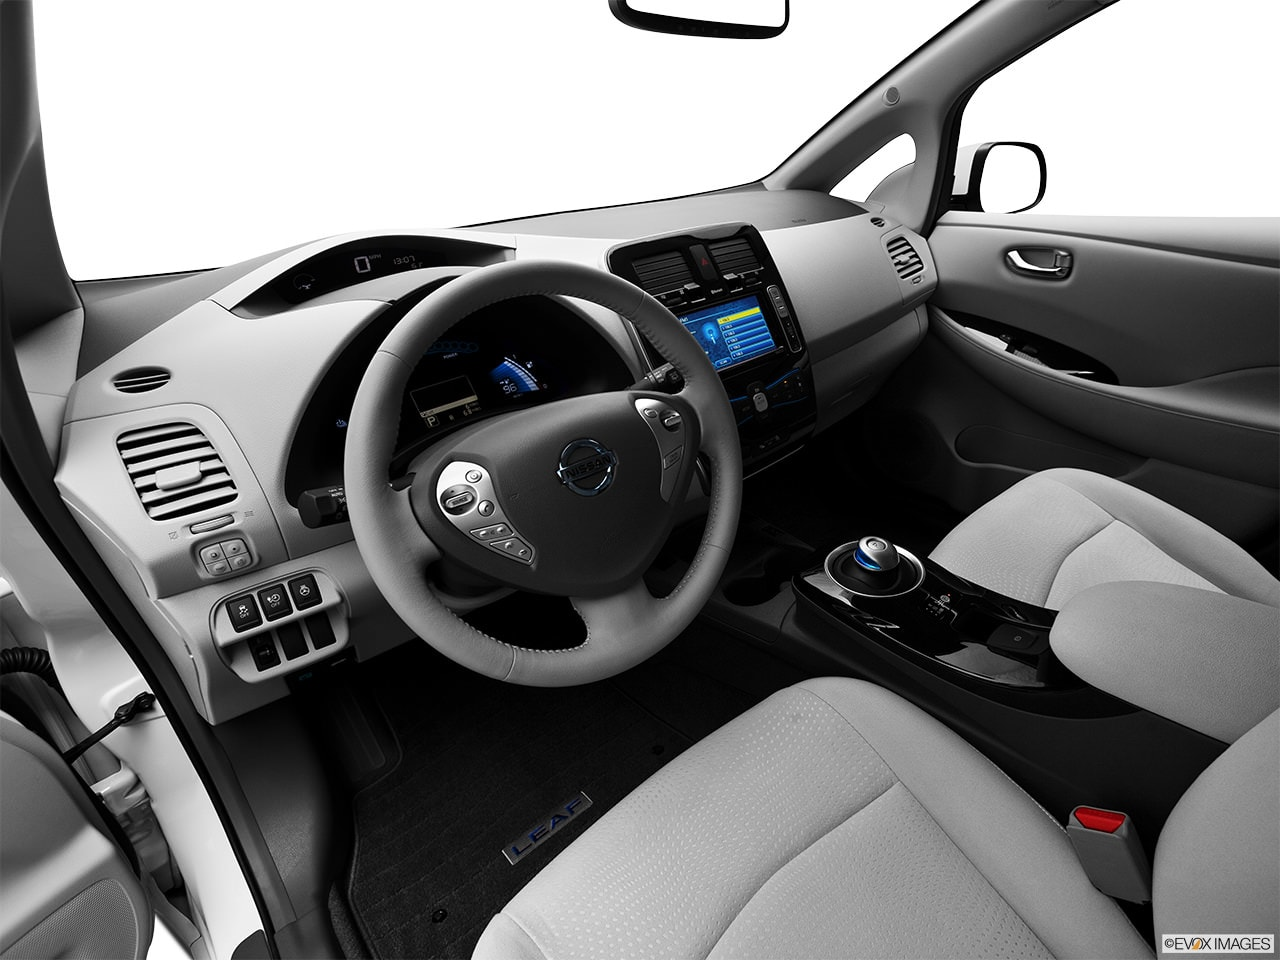 Nissan LEAF 2012 Interior